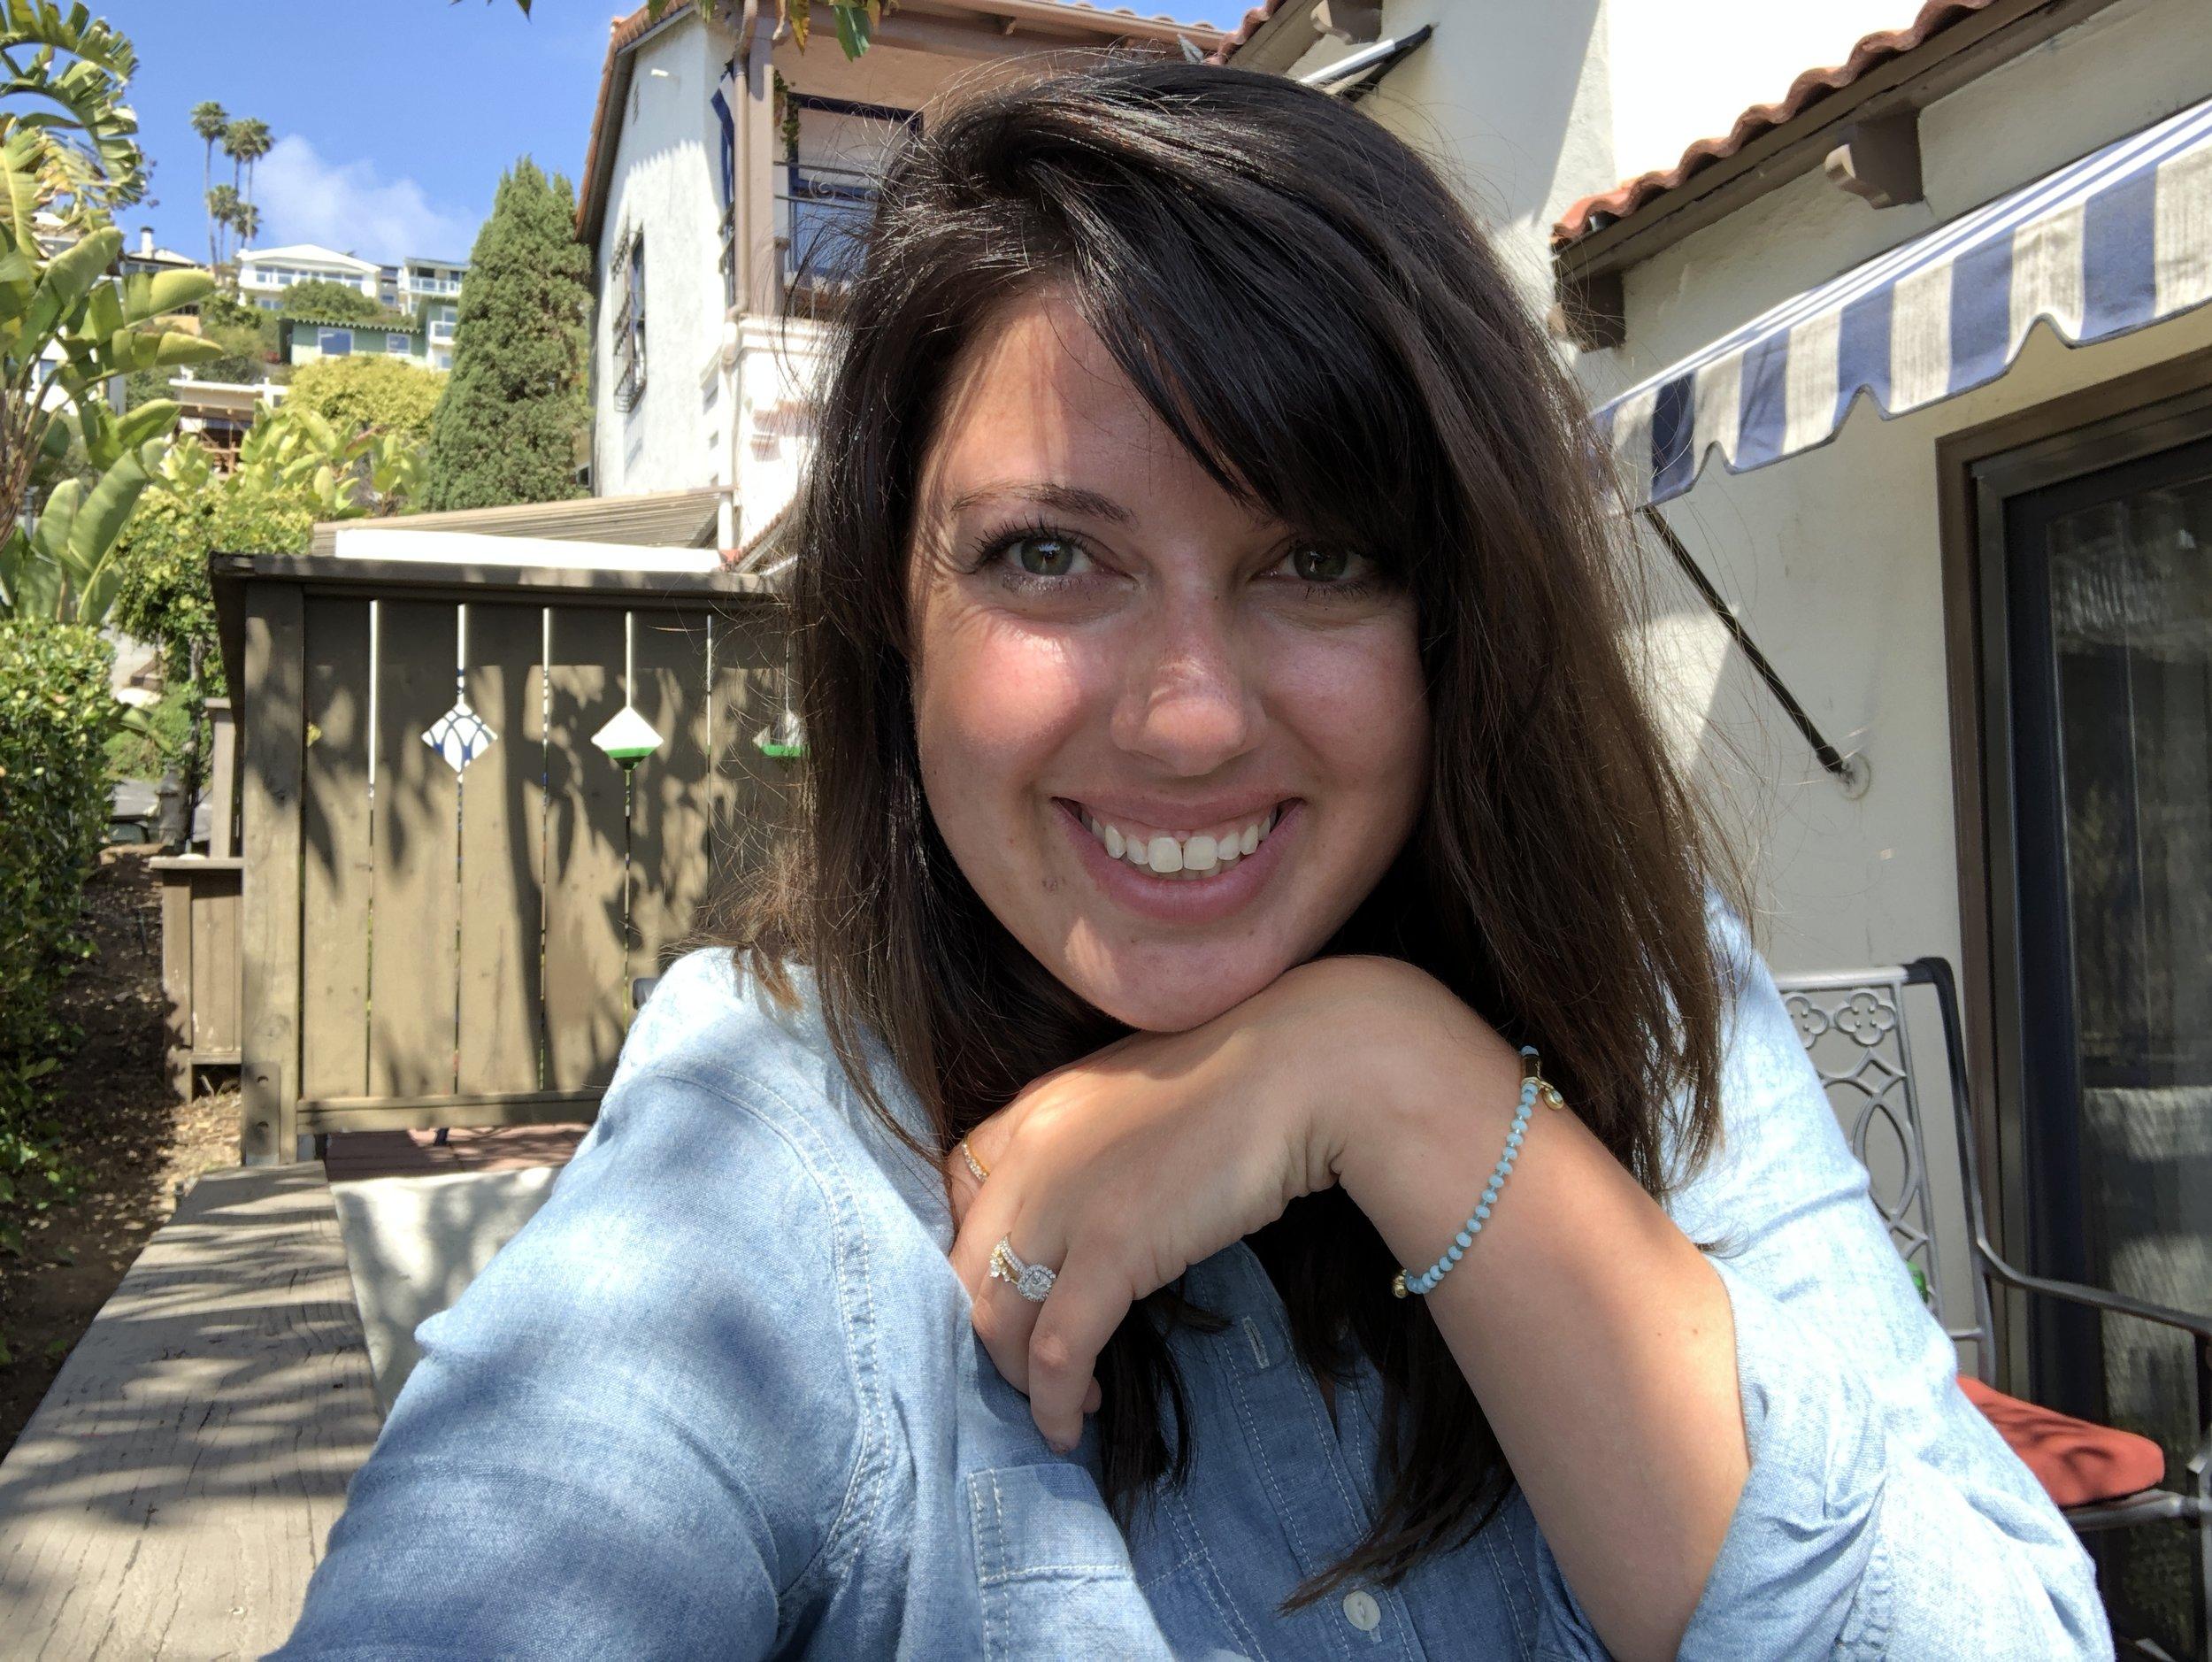 selfie on the patio